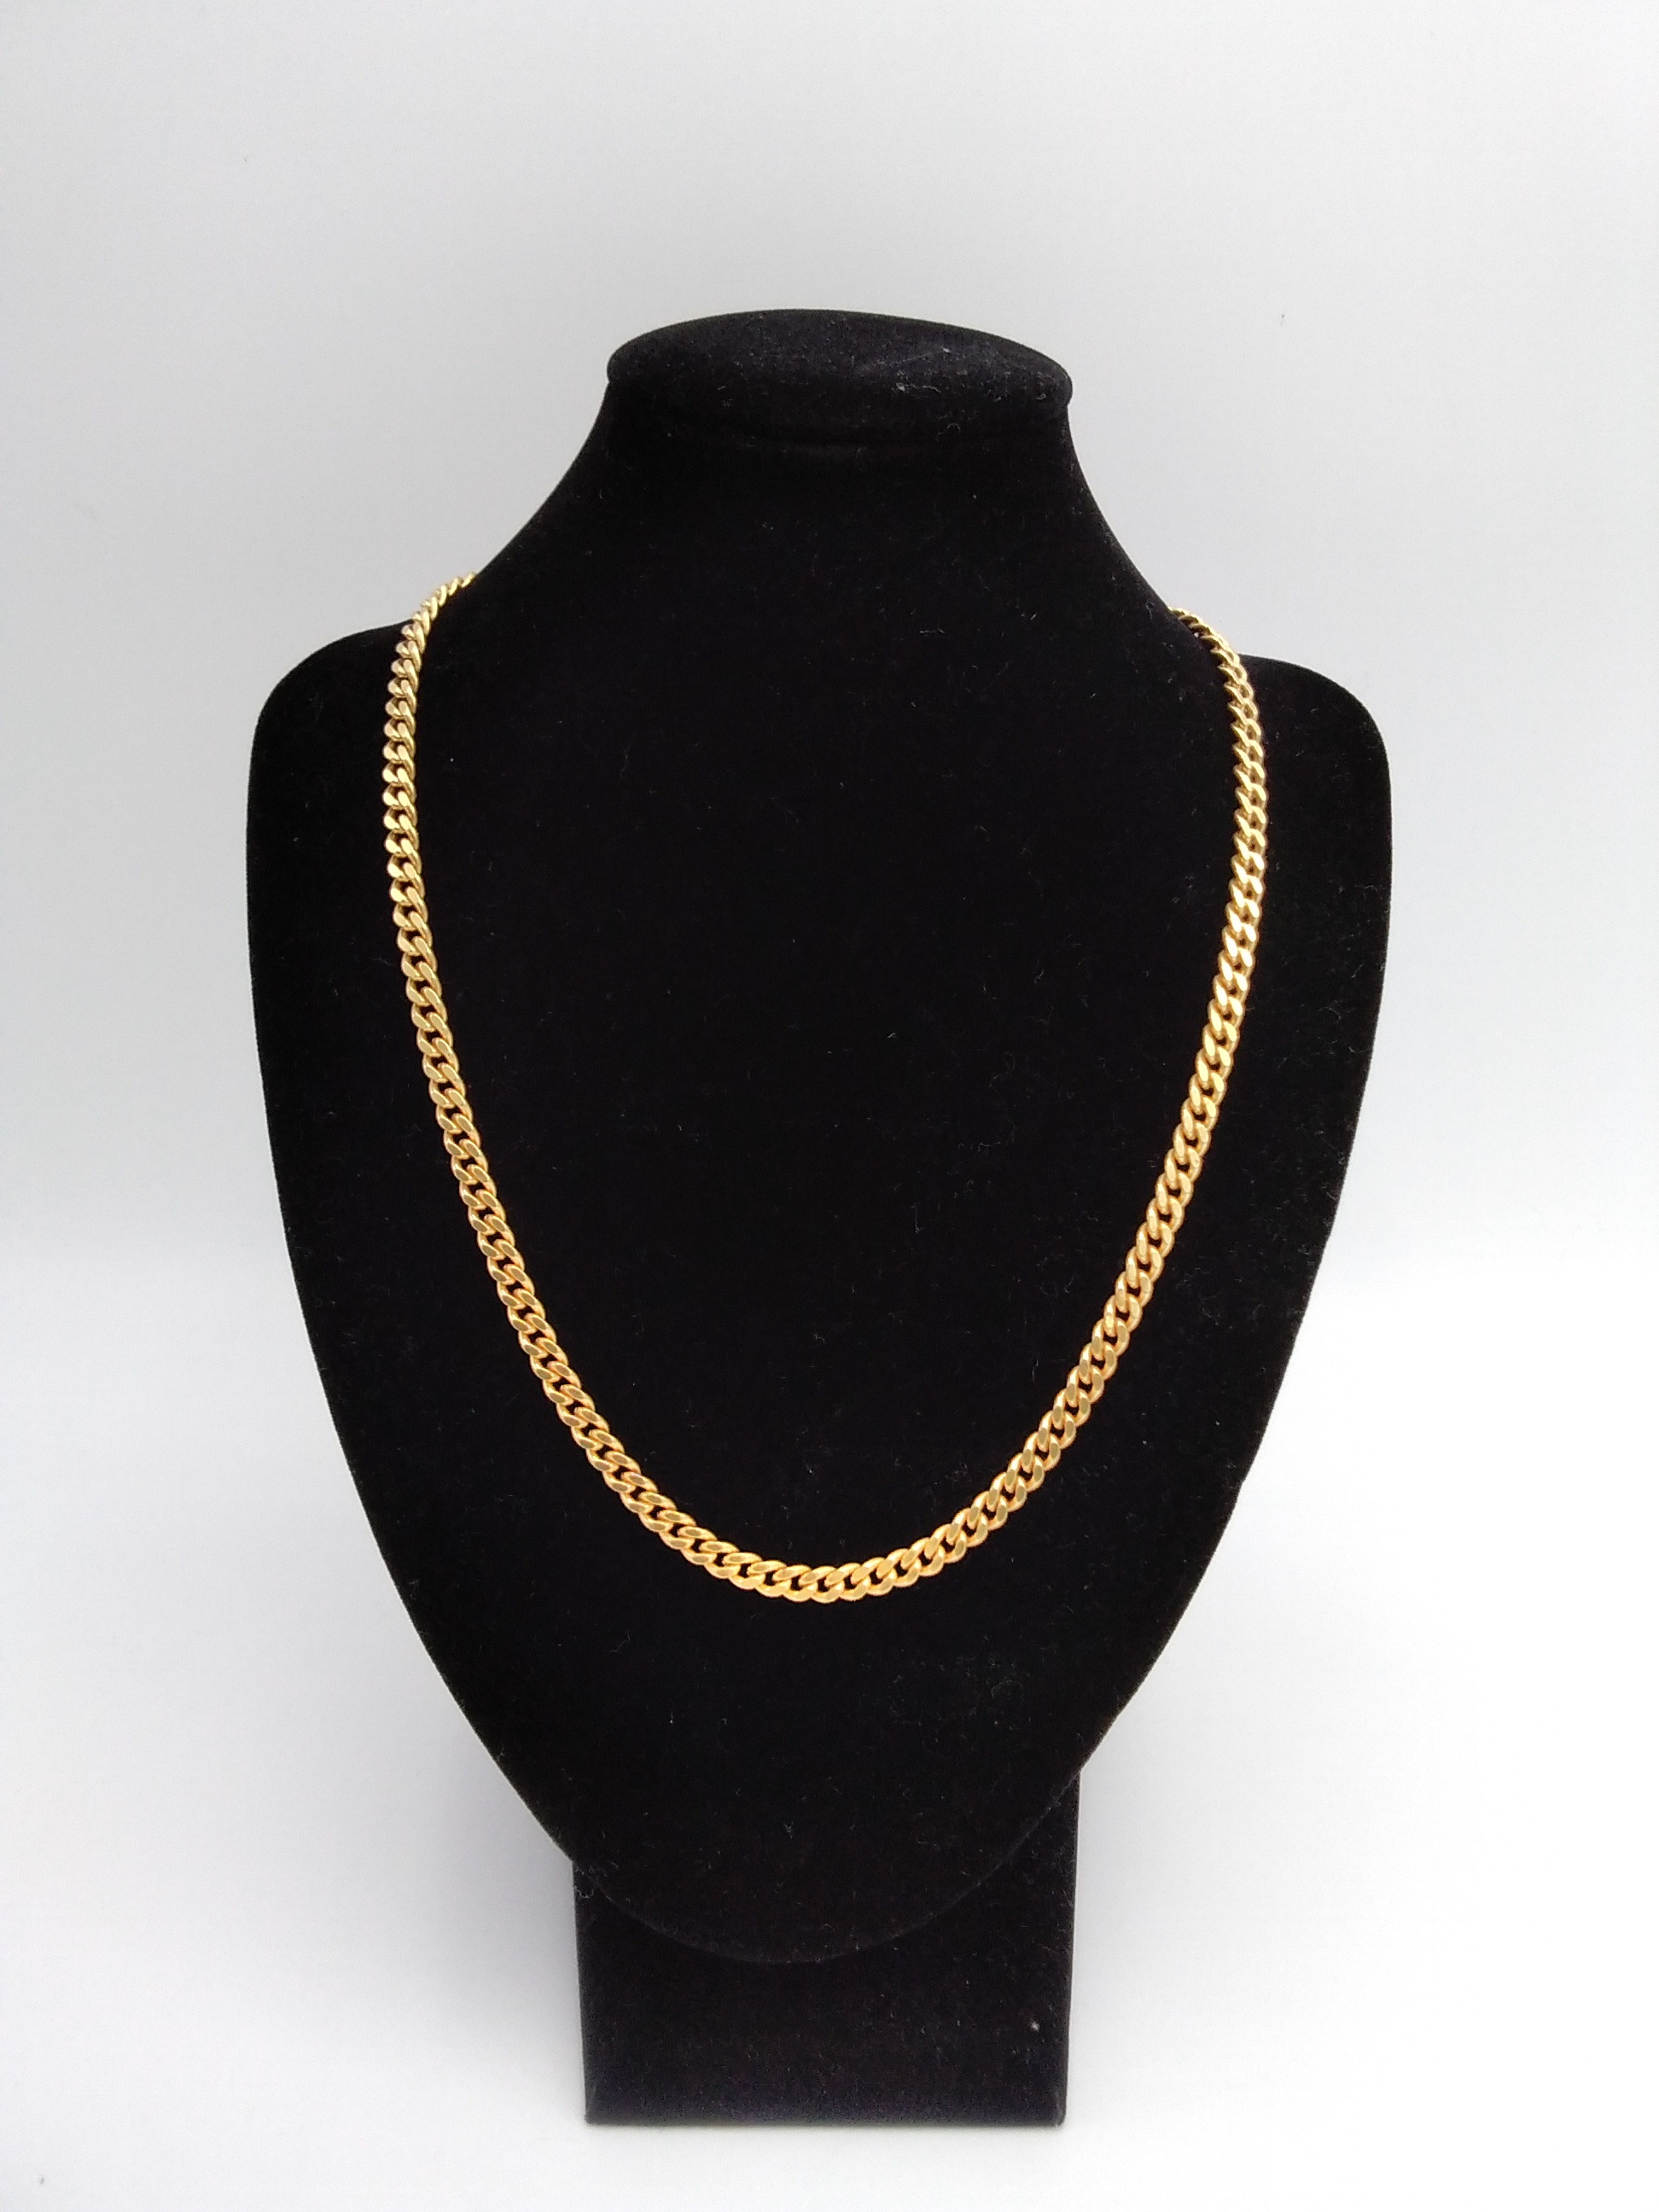 K18喜平ネックレス|宝石無しネックレス